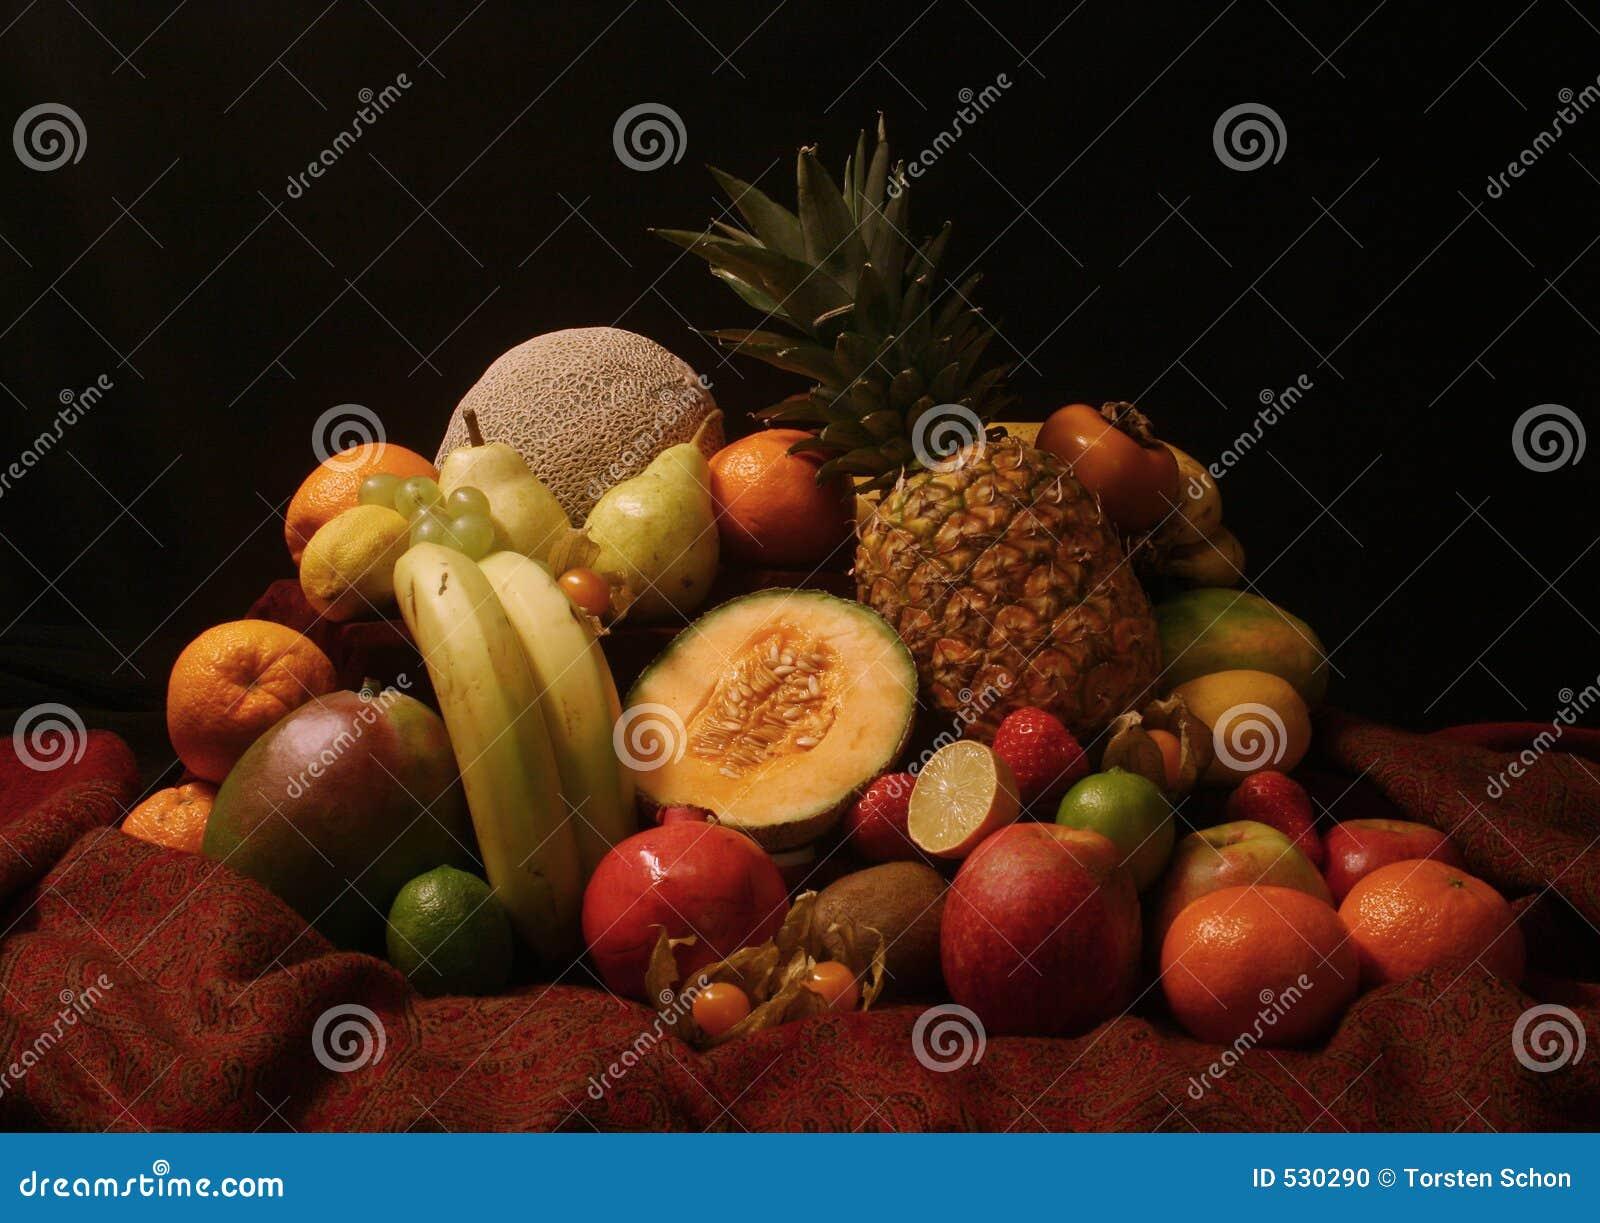 Download 结果实美丽如画的stilllife 库存照片. 图片 包括有 柑橘, 摄影, 草莓, 黑暗, 营养, 绘画, 仍然 - 530290